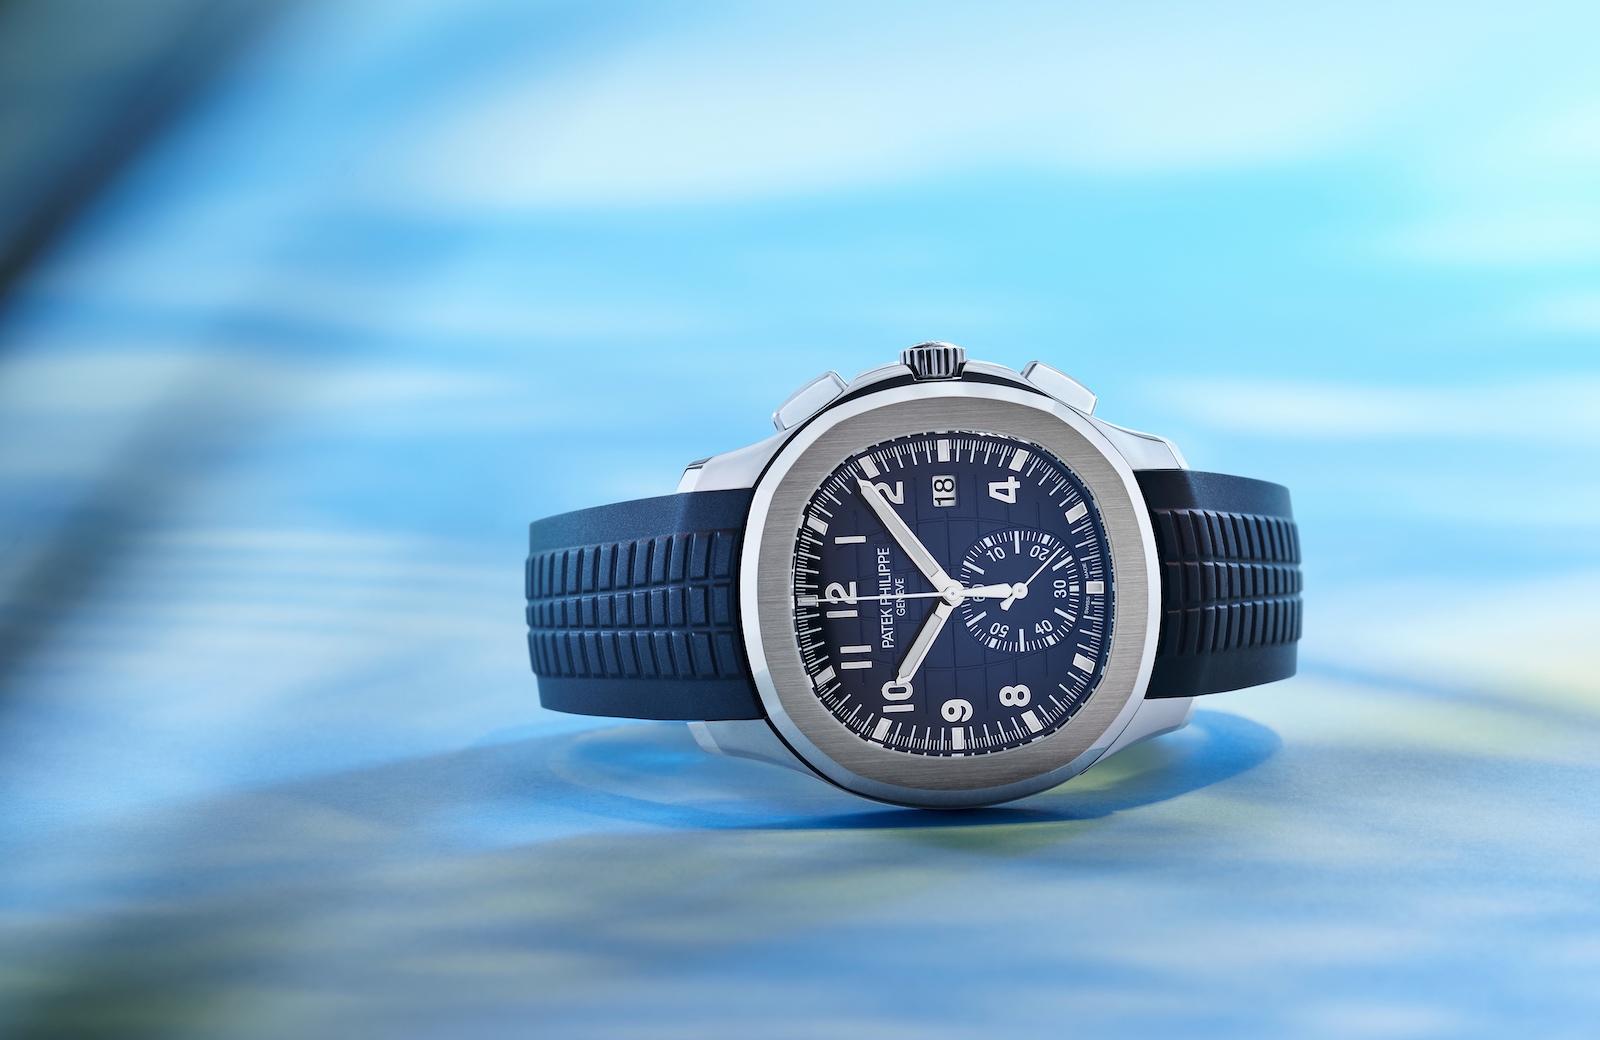 Patek Philippe Aquanaut Chronograph 5968G - blue